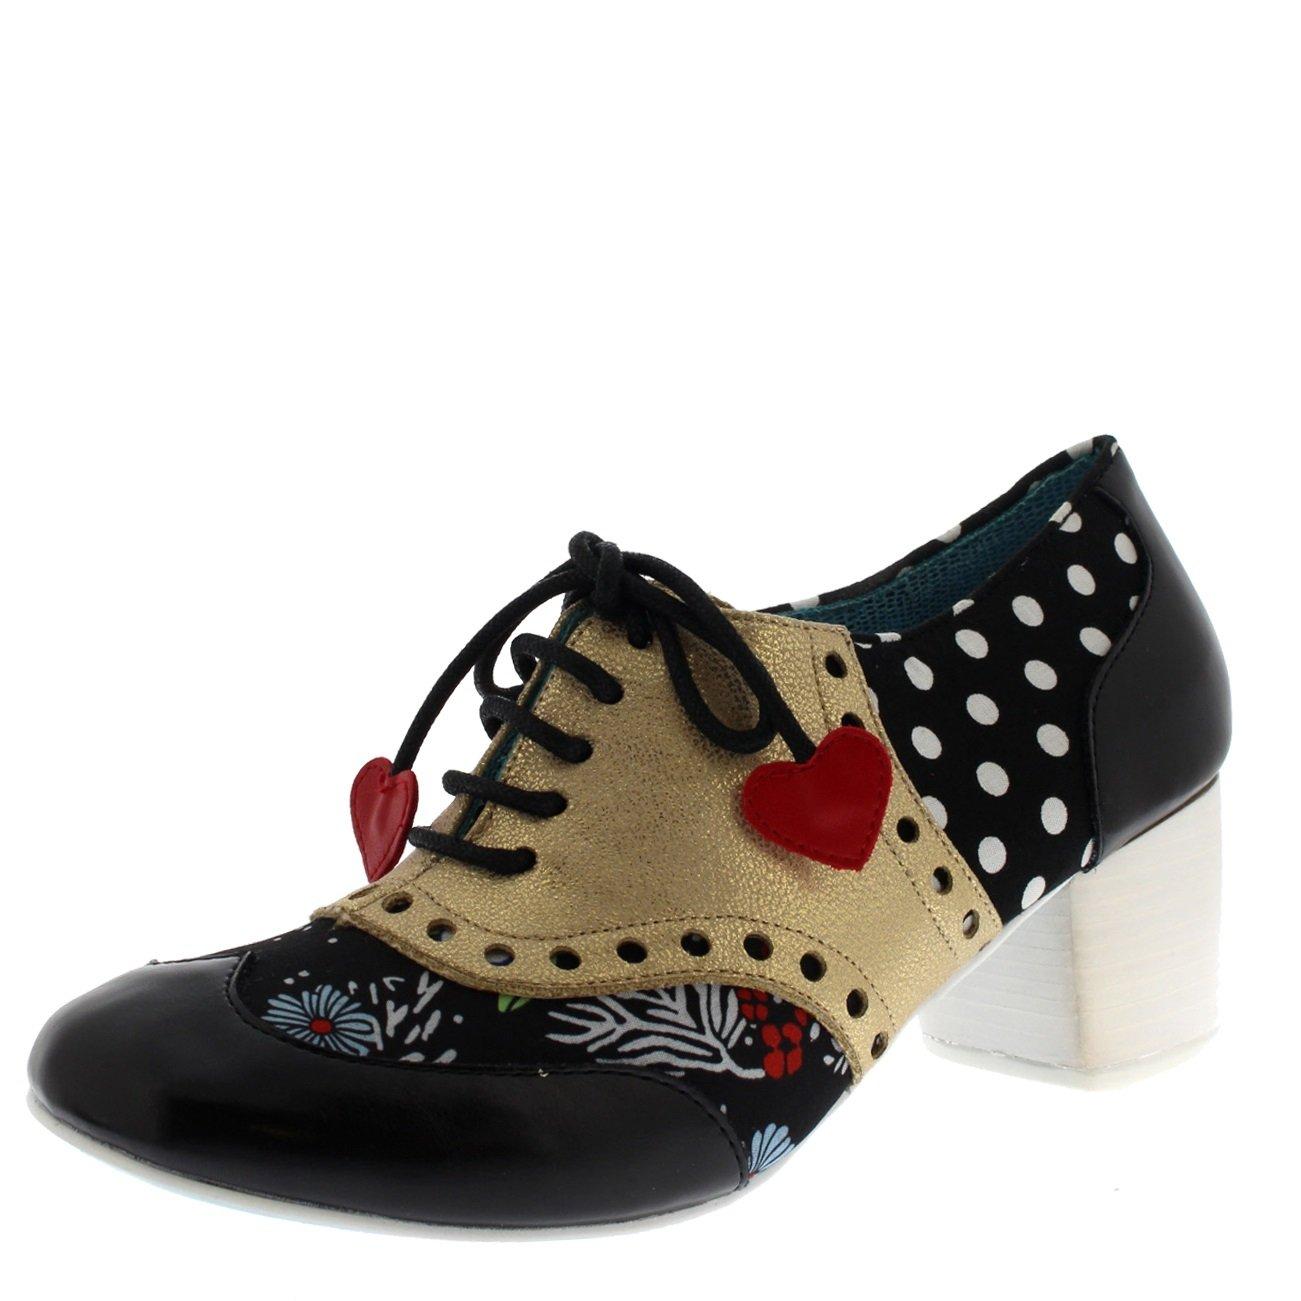 Irregular Choice Womens Clara Bow Oxfords Love Hearts Pretty Heels - Black/Gold - 9